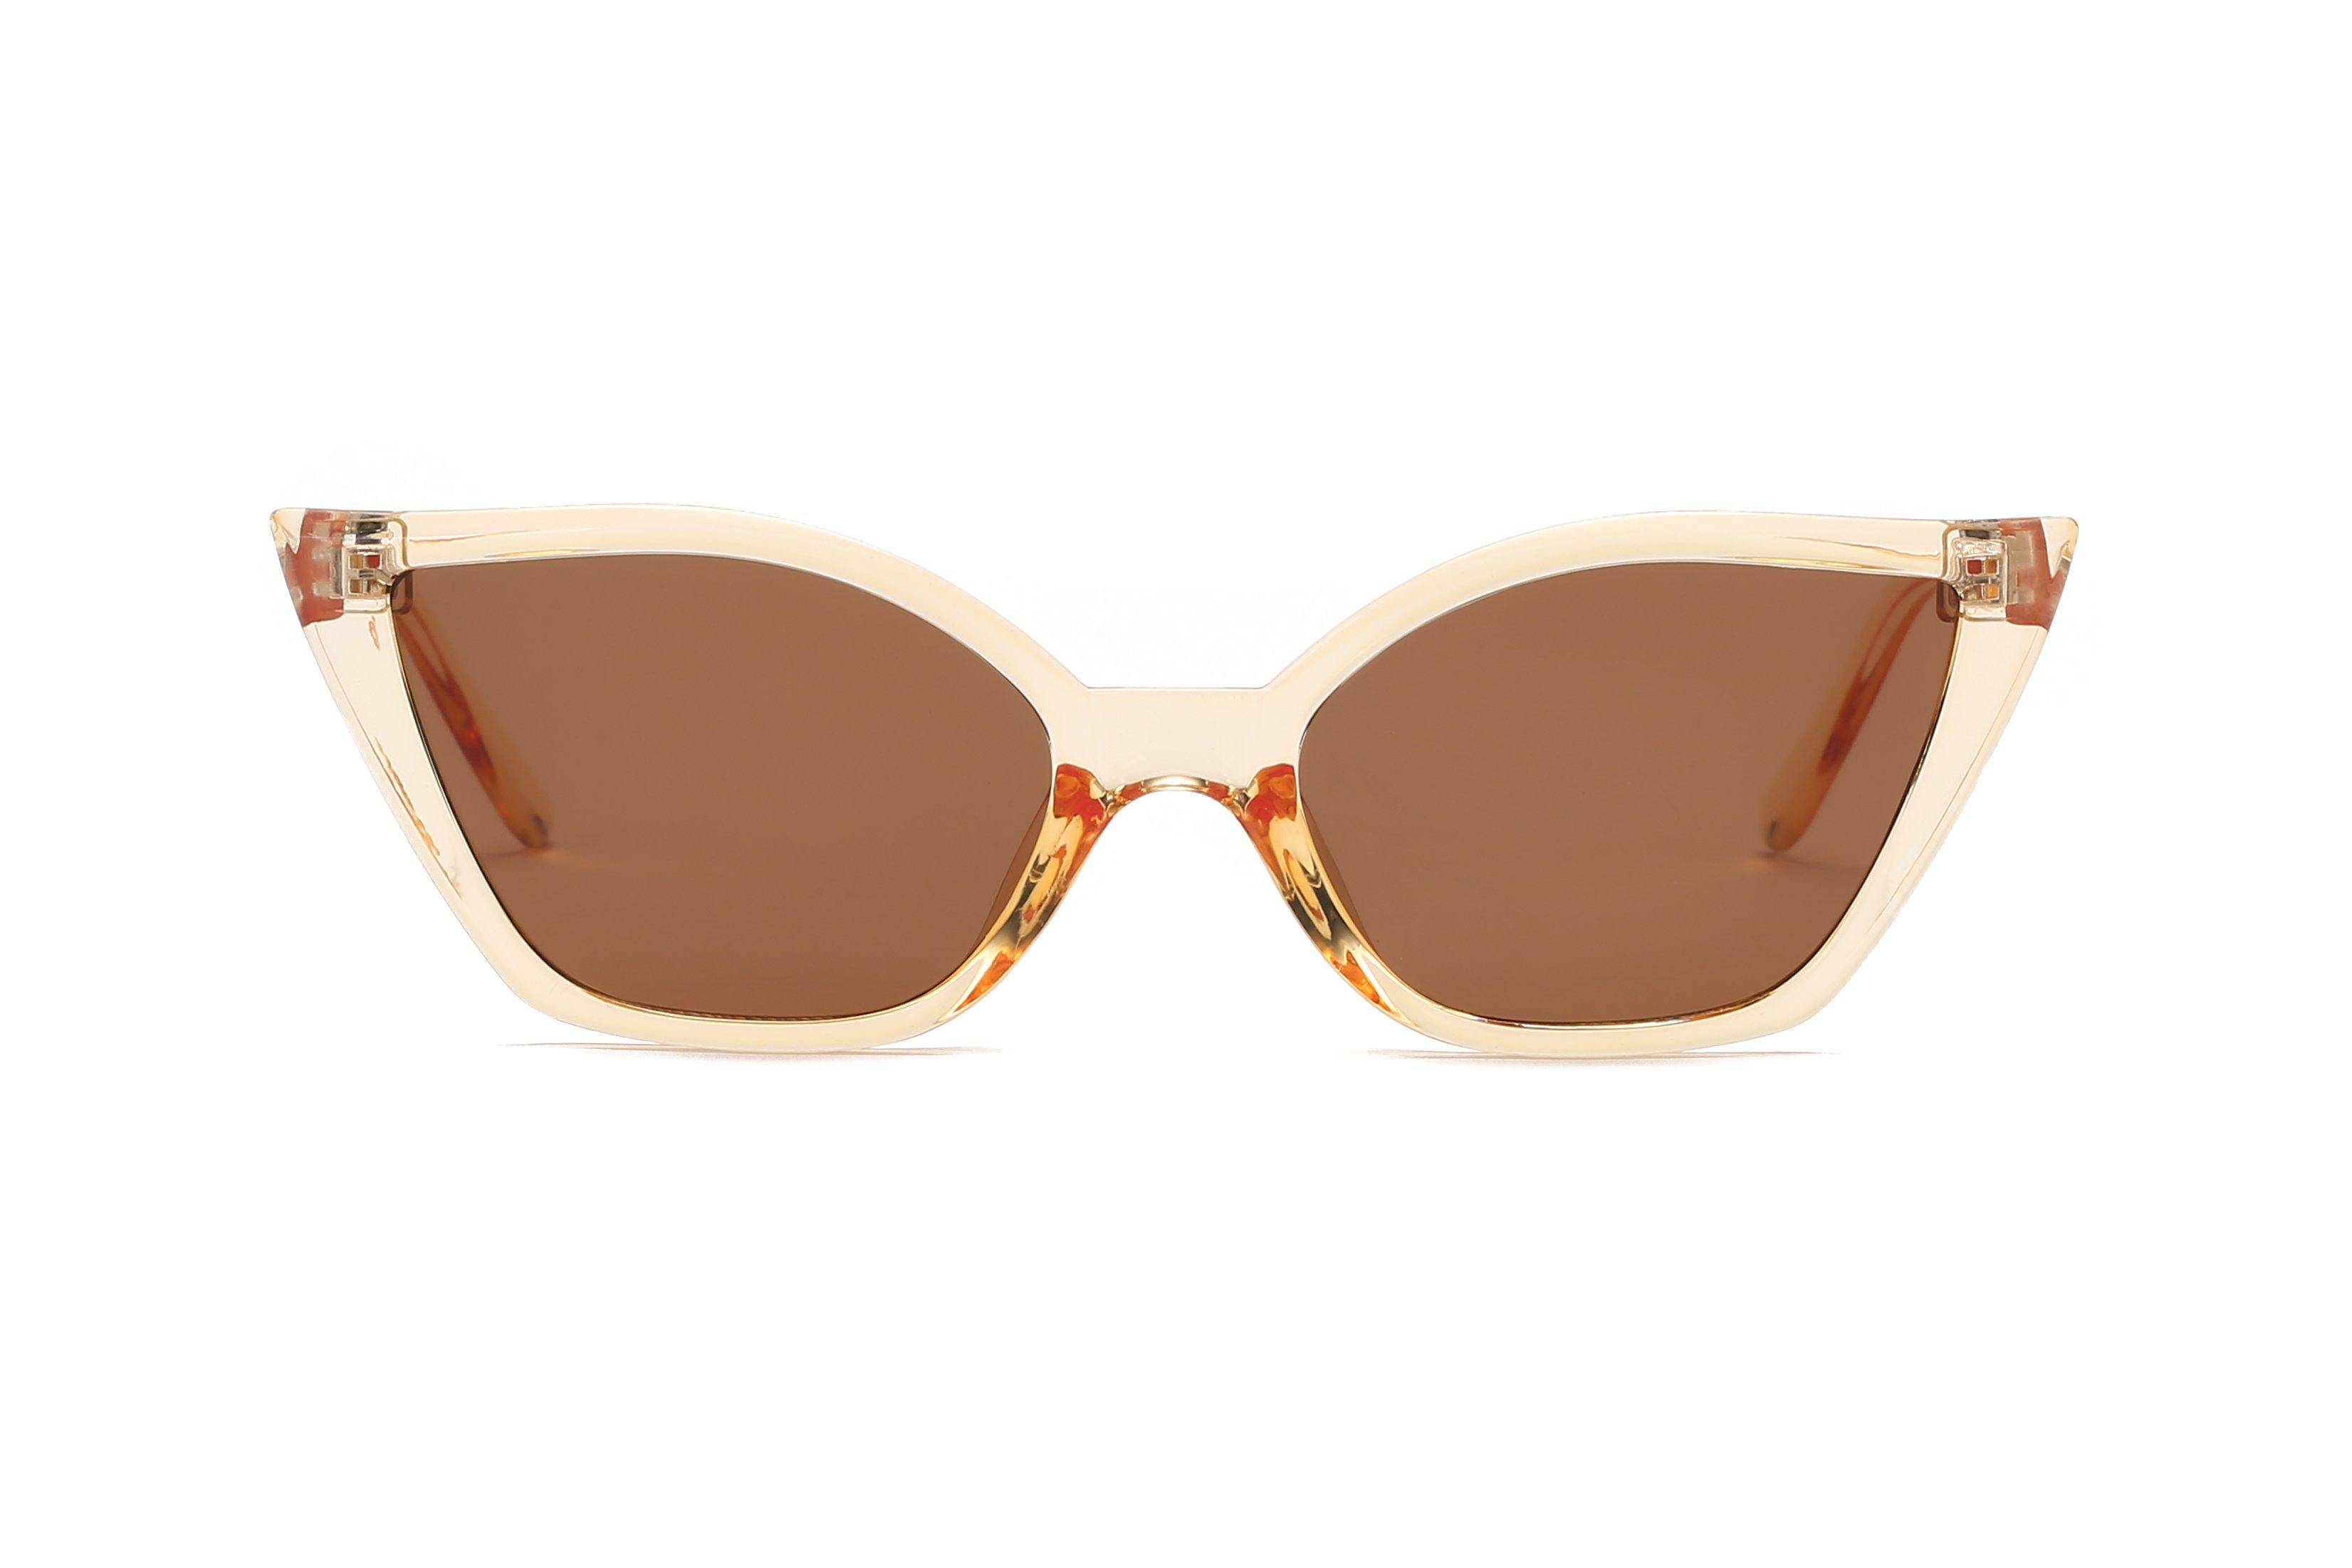 Retro Vintage Cat-eye sunglasses -Brown - Front